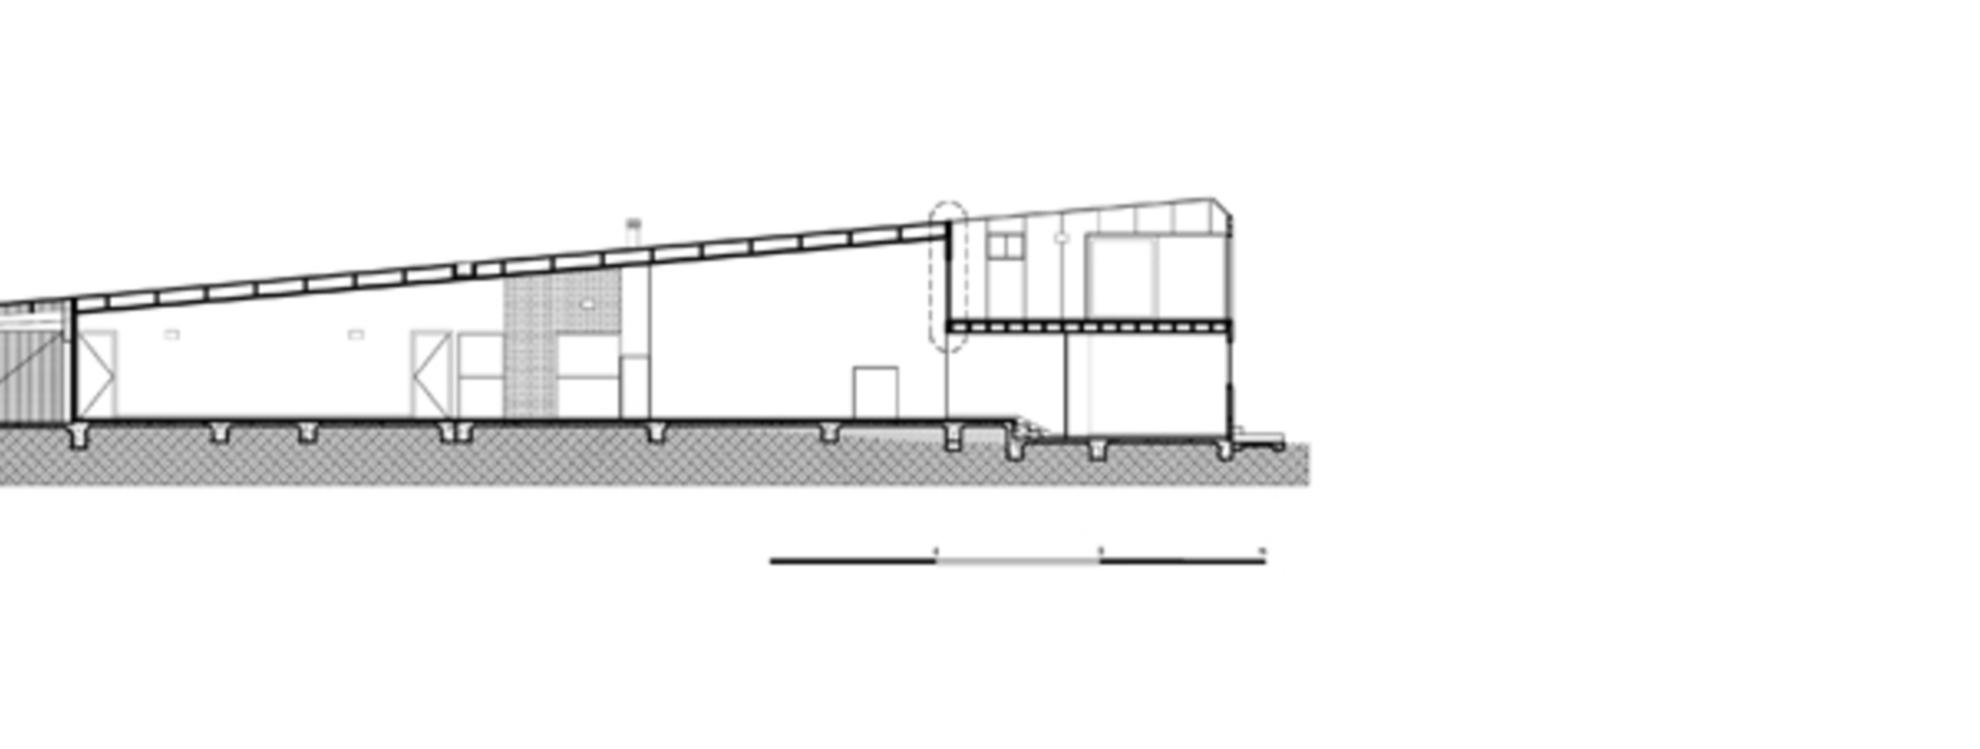 Mcbride Charles Ryan Letterbox House Floornature - Letterbox-house-in-blairgowrie-australia